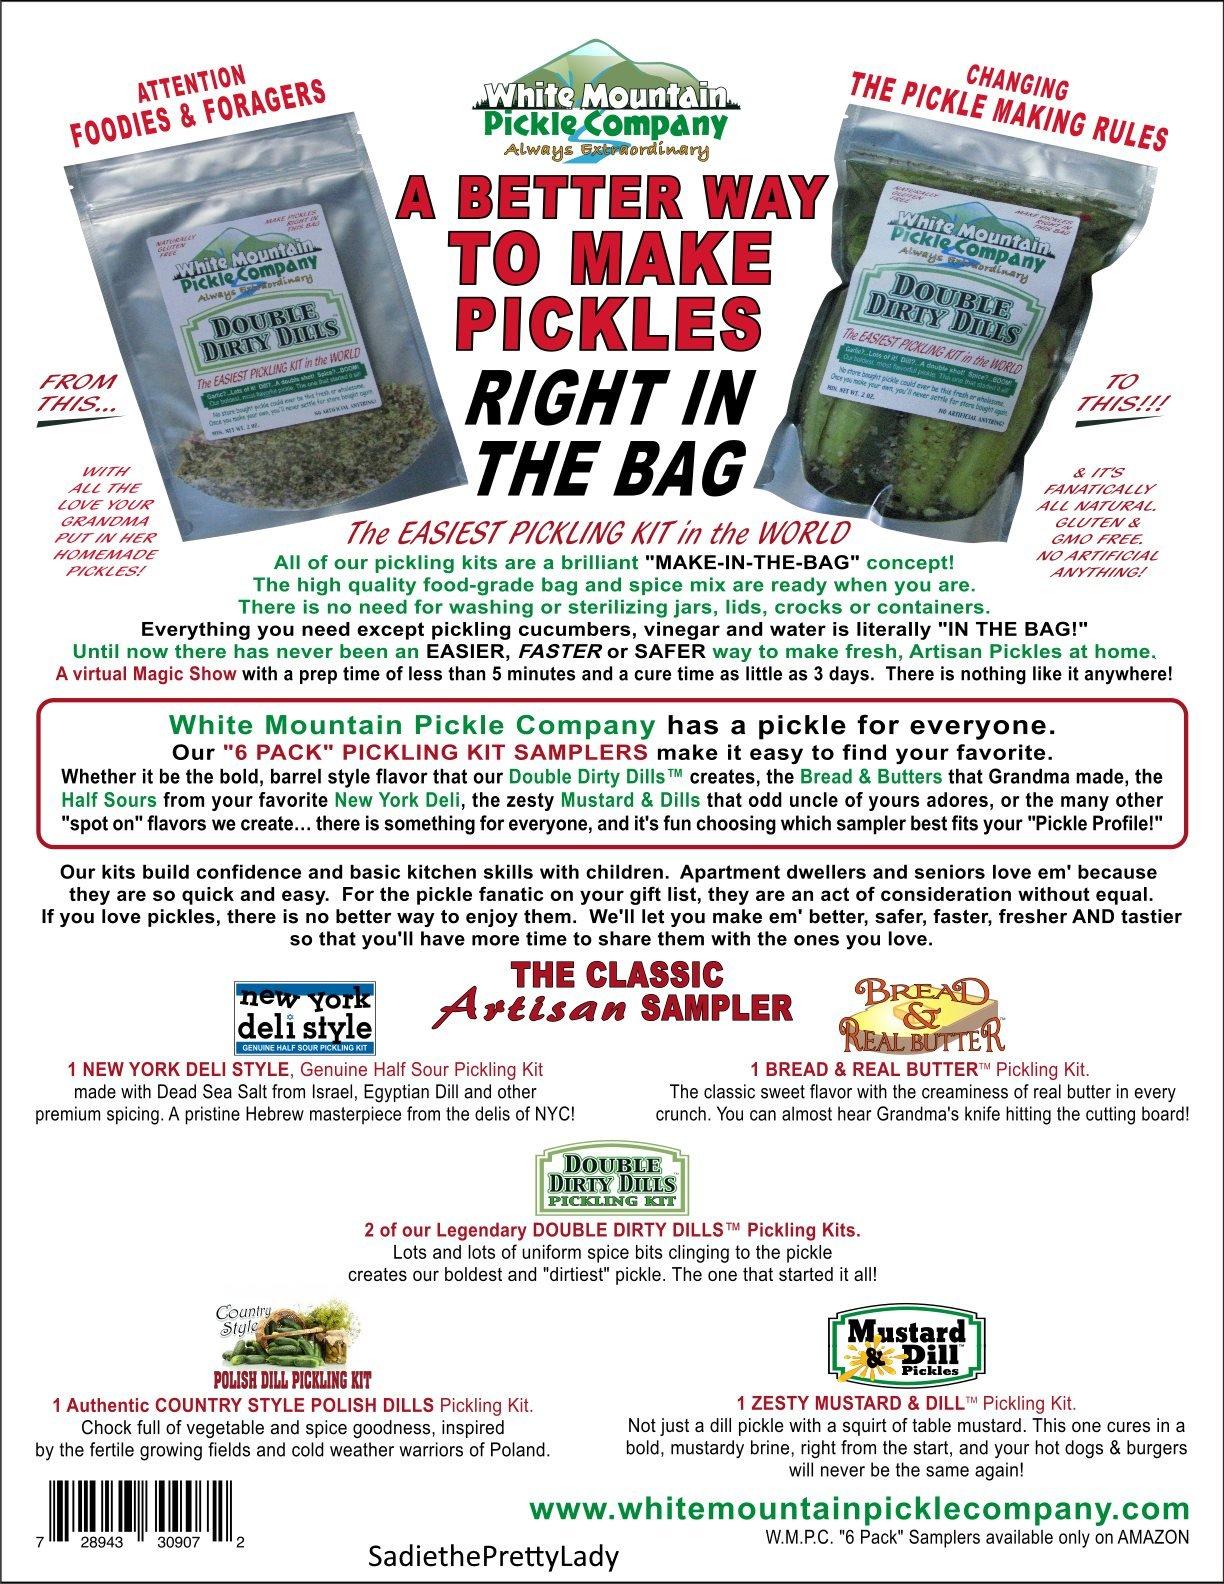 White Mountain Pickle Company The Classic Artisan Sampler Pickling Kit - 6 Pack